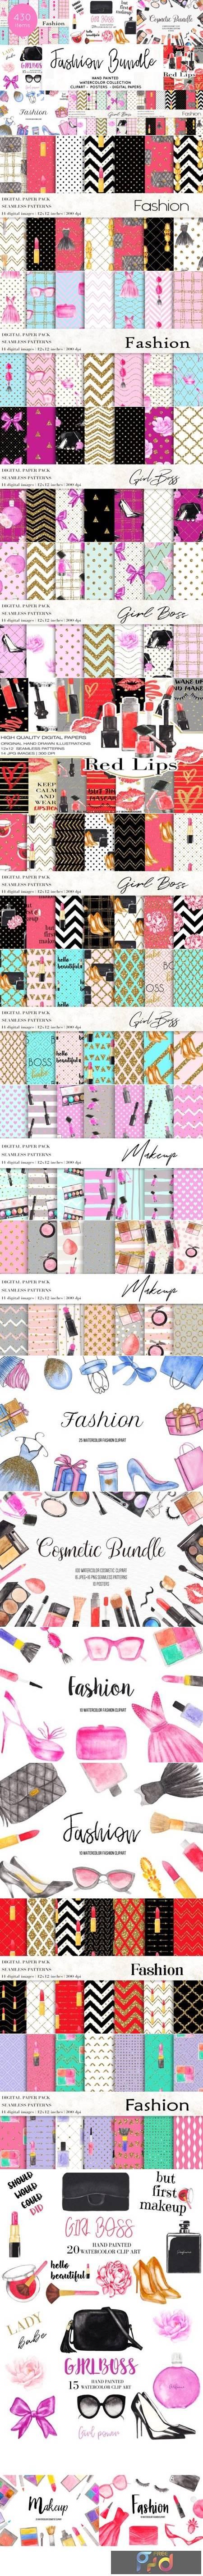 Watercolor Fashion Makeup Bundle 3826179 1